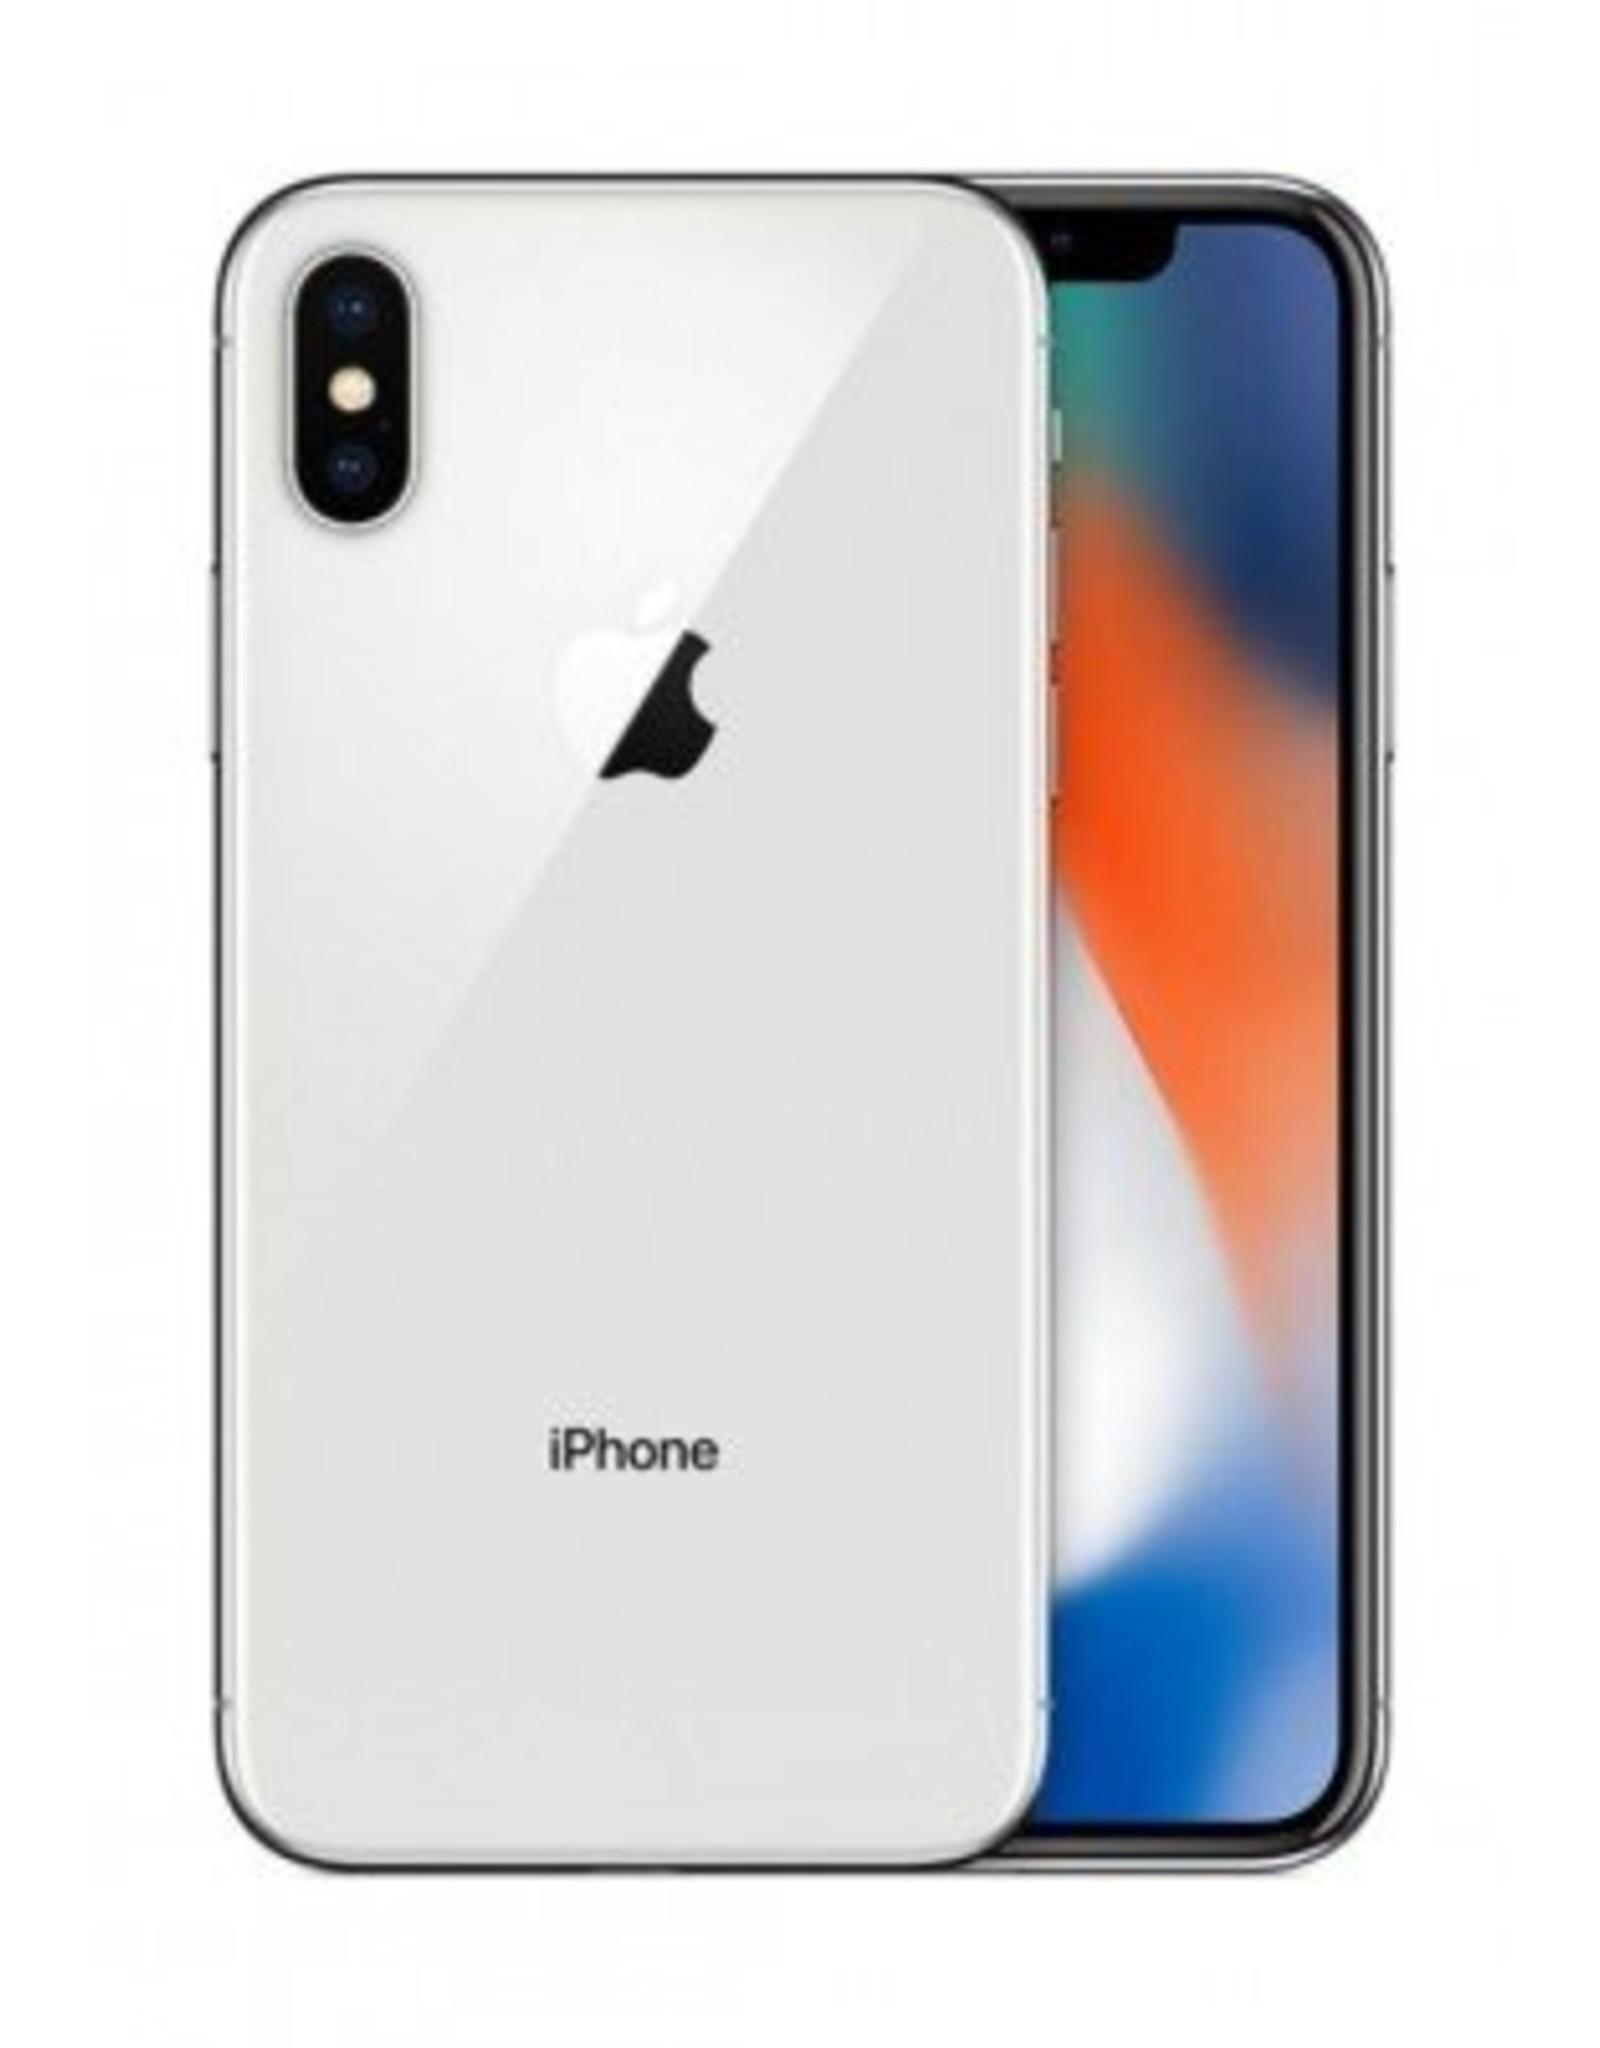 Apple Apple iPhone X - 64 GB (NEW)